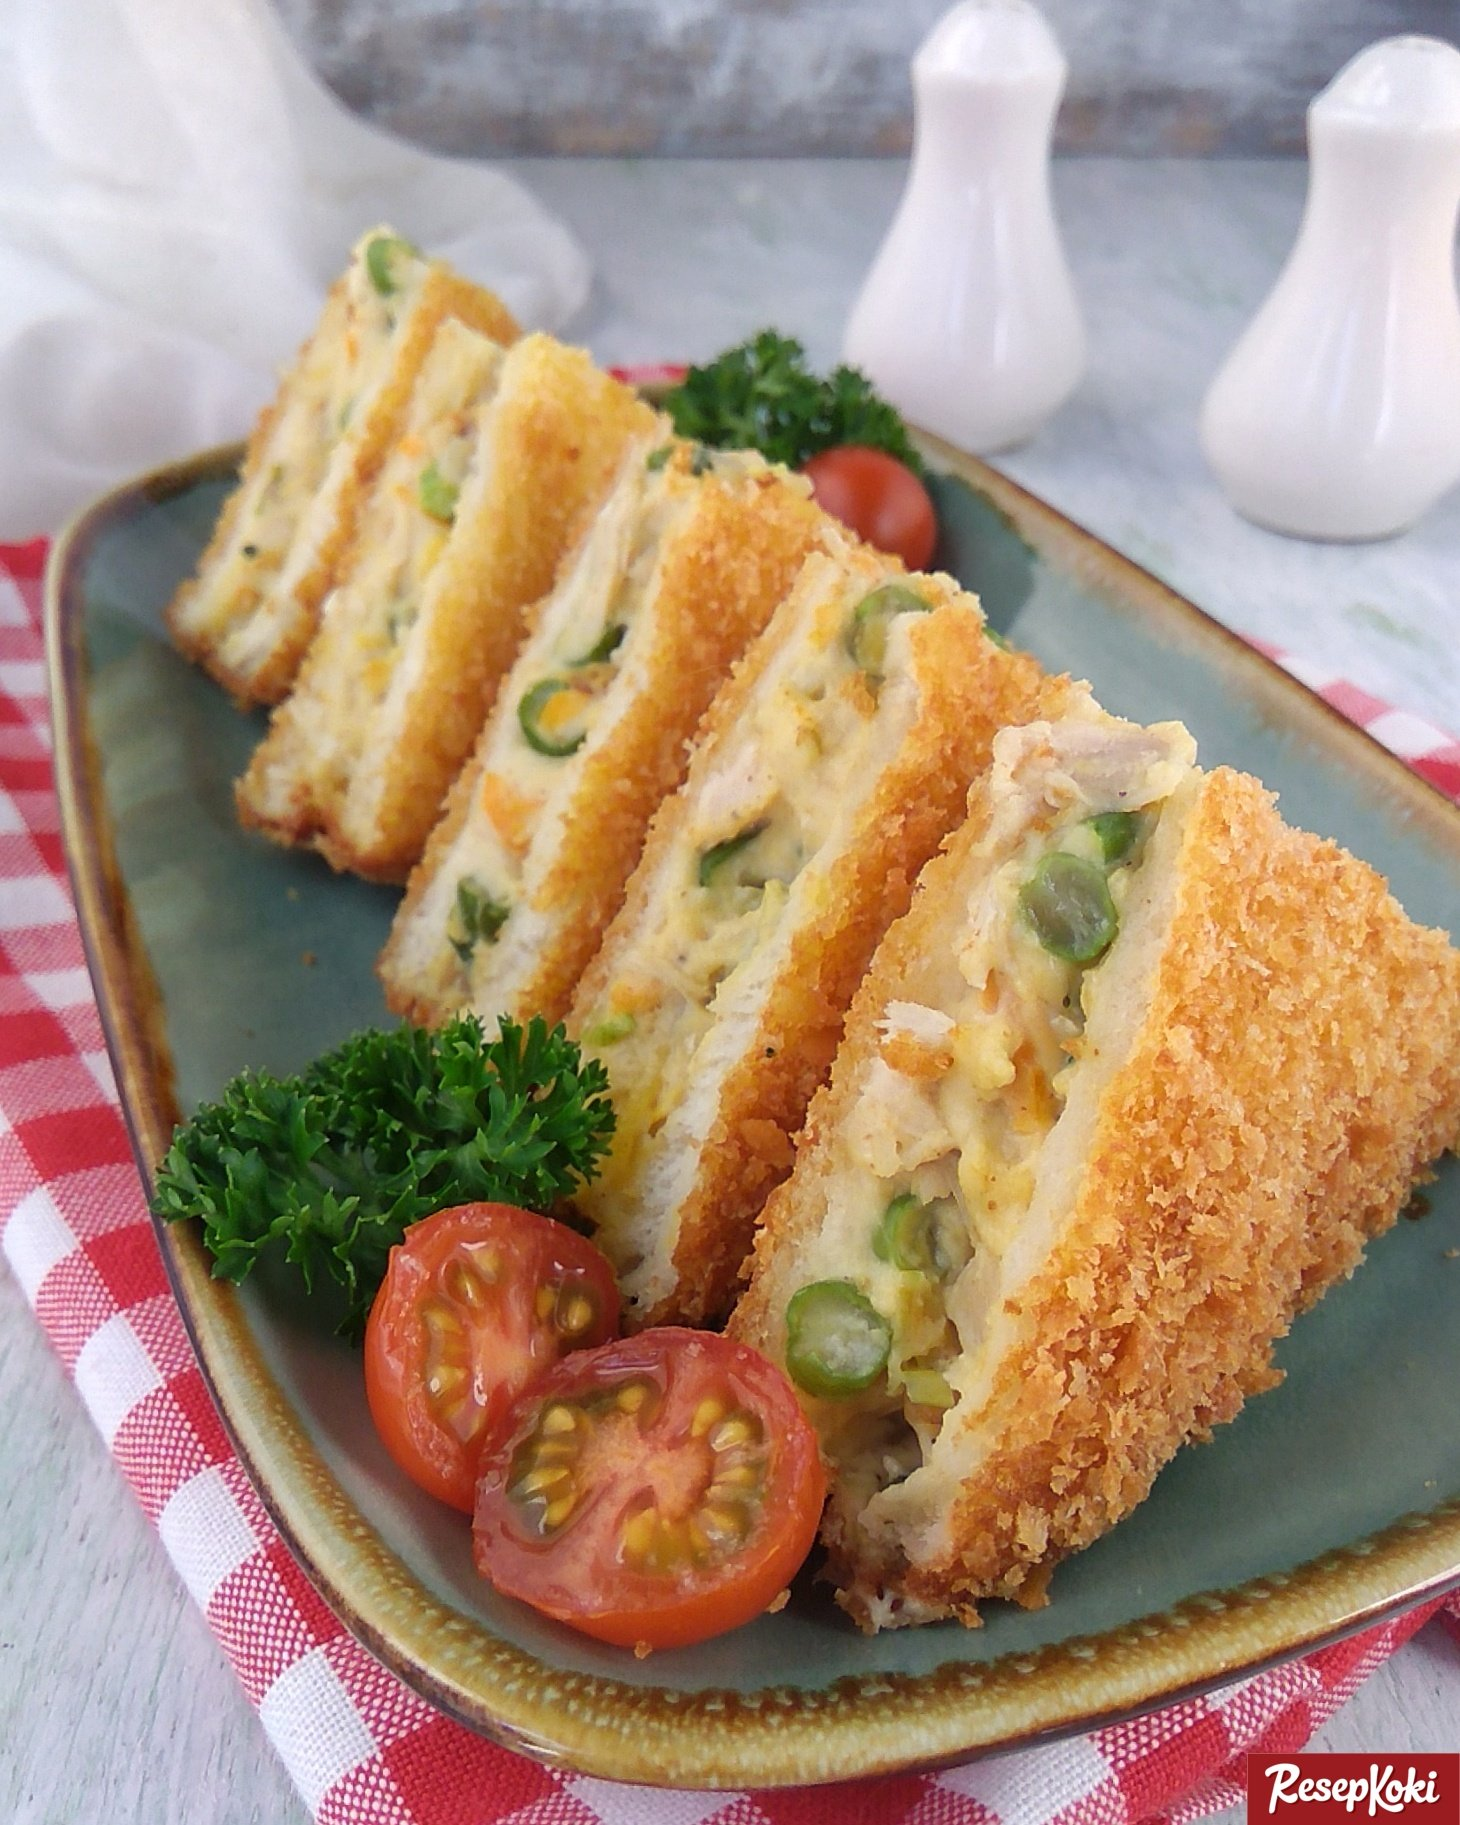 Roti Tawar Goreng Isi Ragout Krispi Mudah Dibuat - Resep | ResepKoki